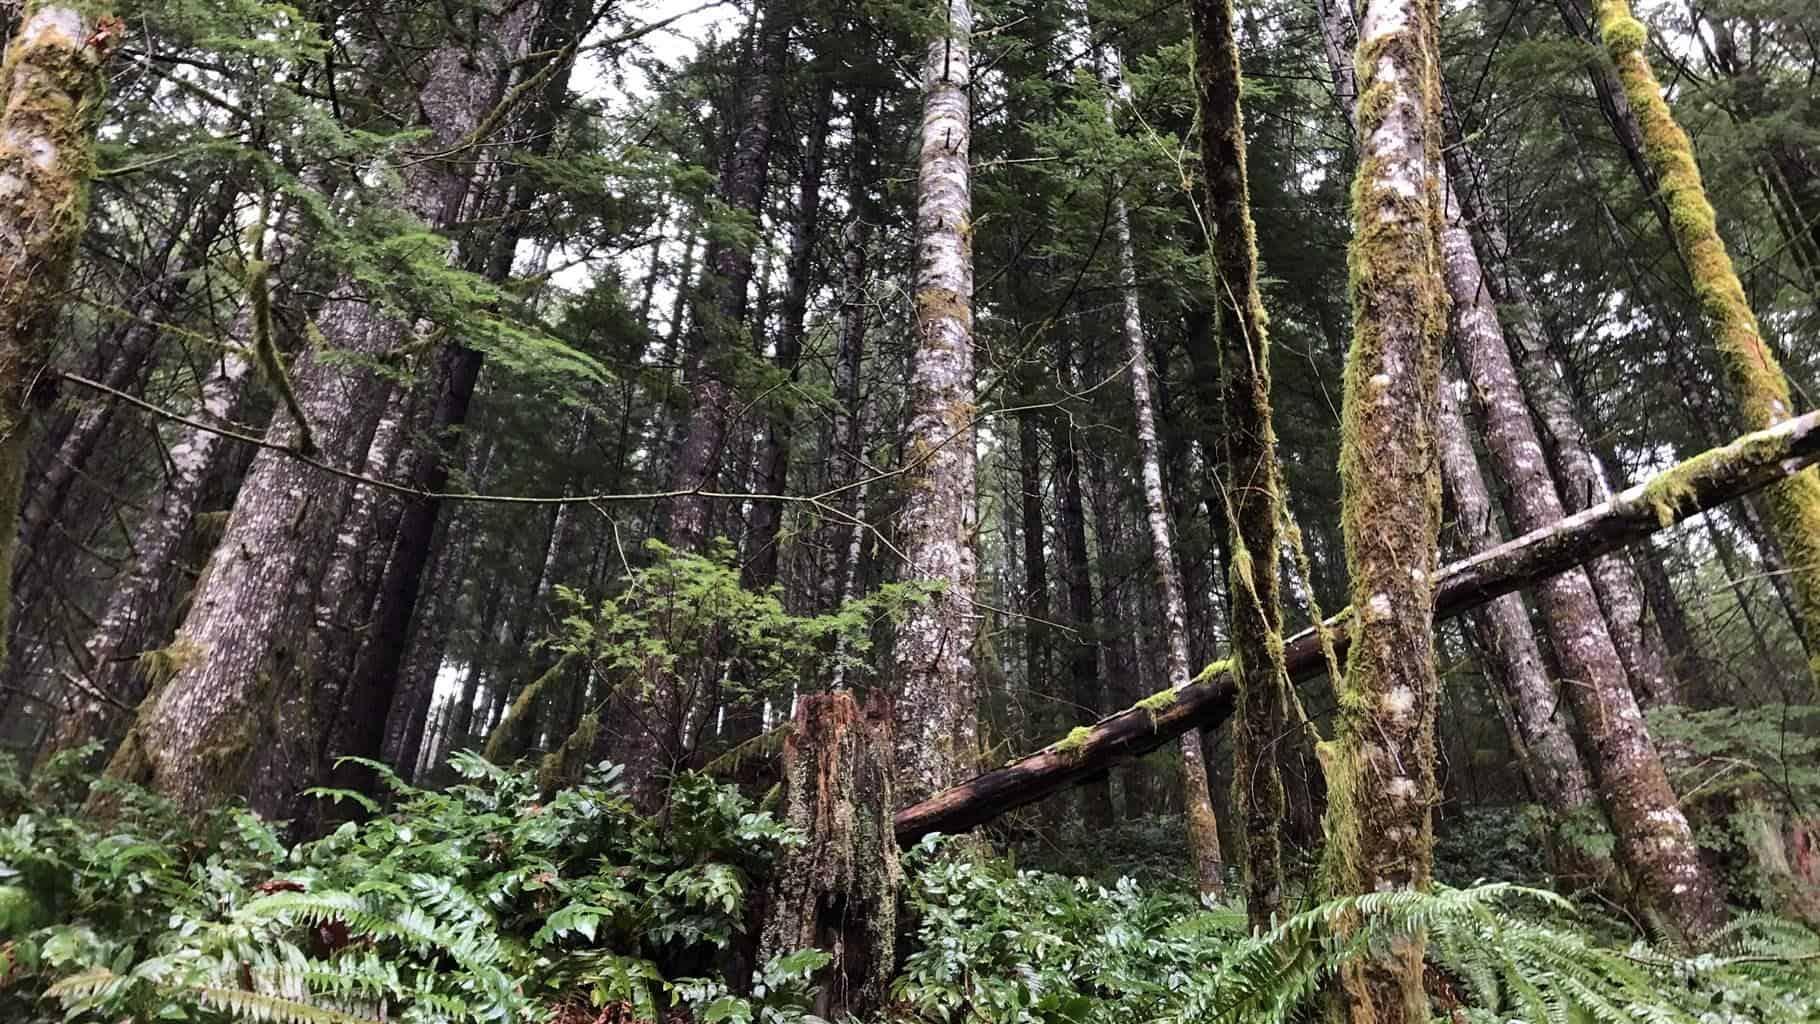 Forest Land near Washington's Merrill Lake